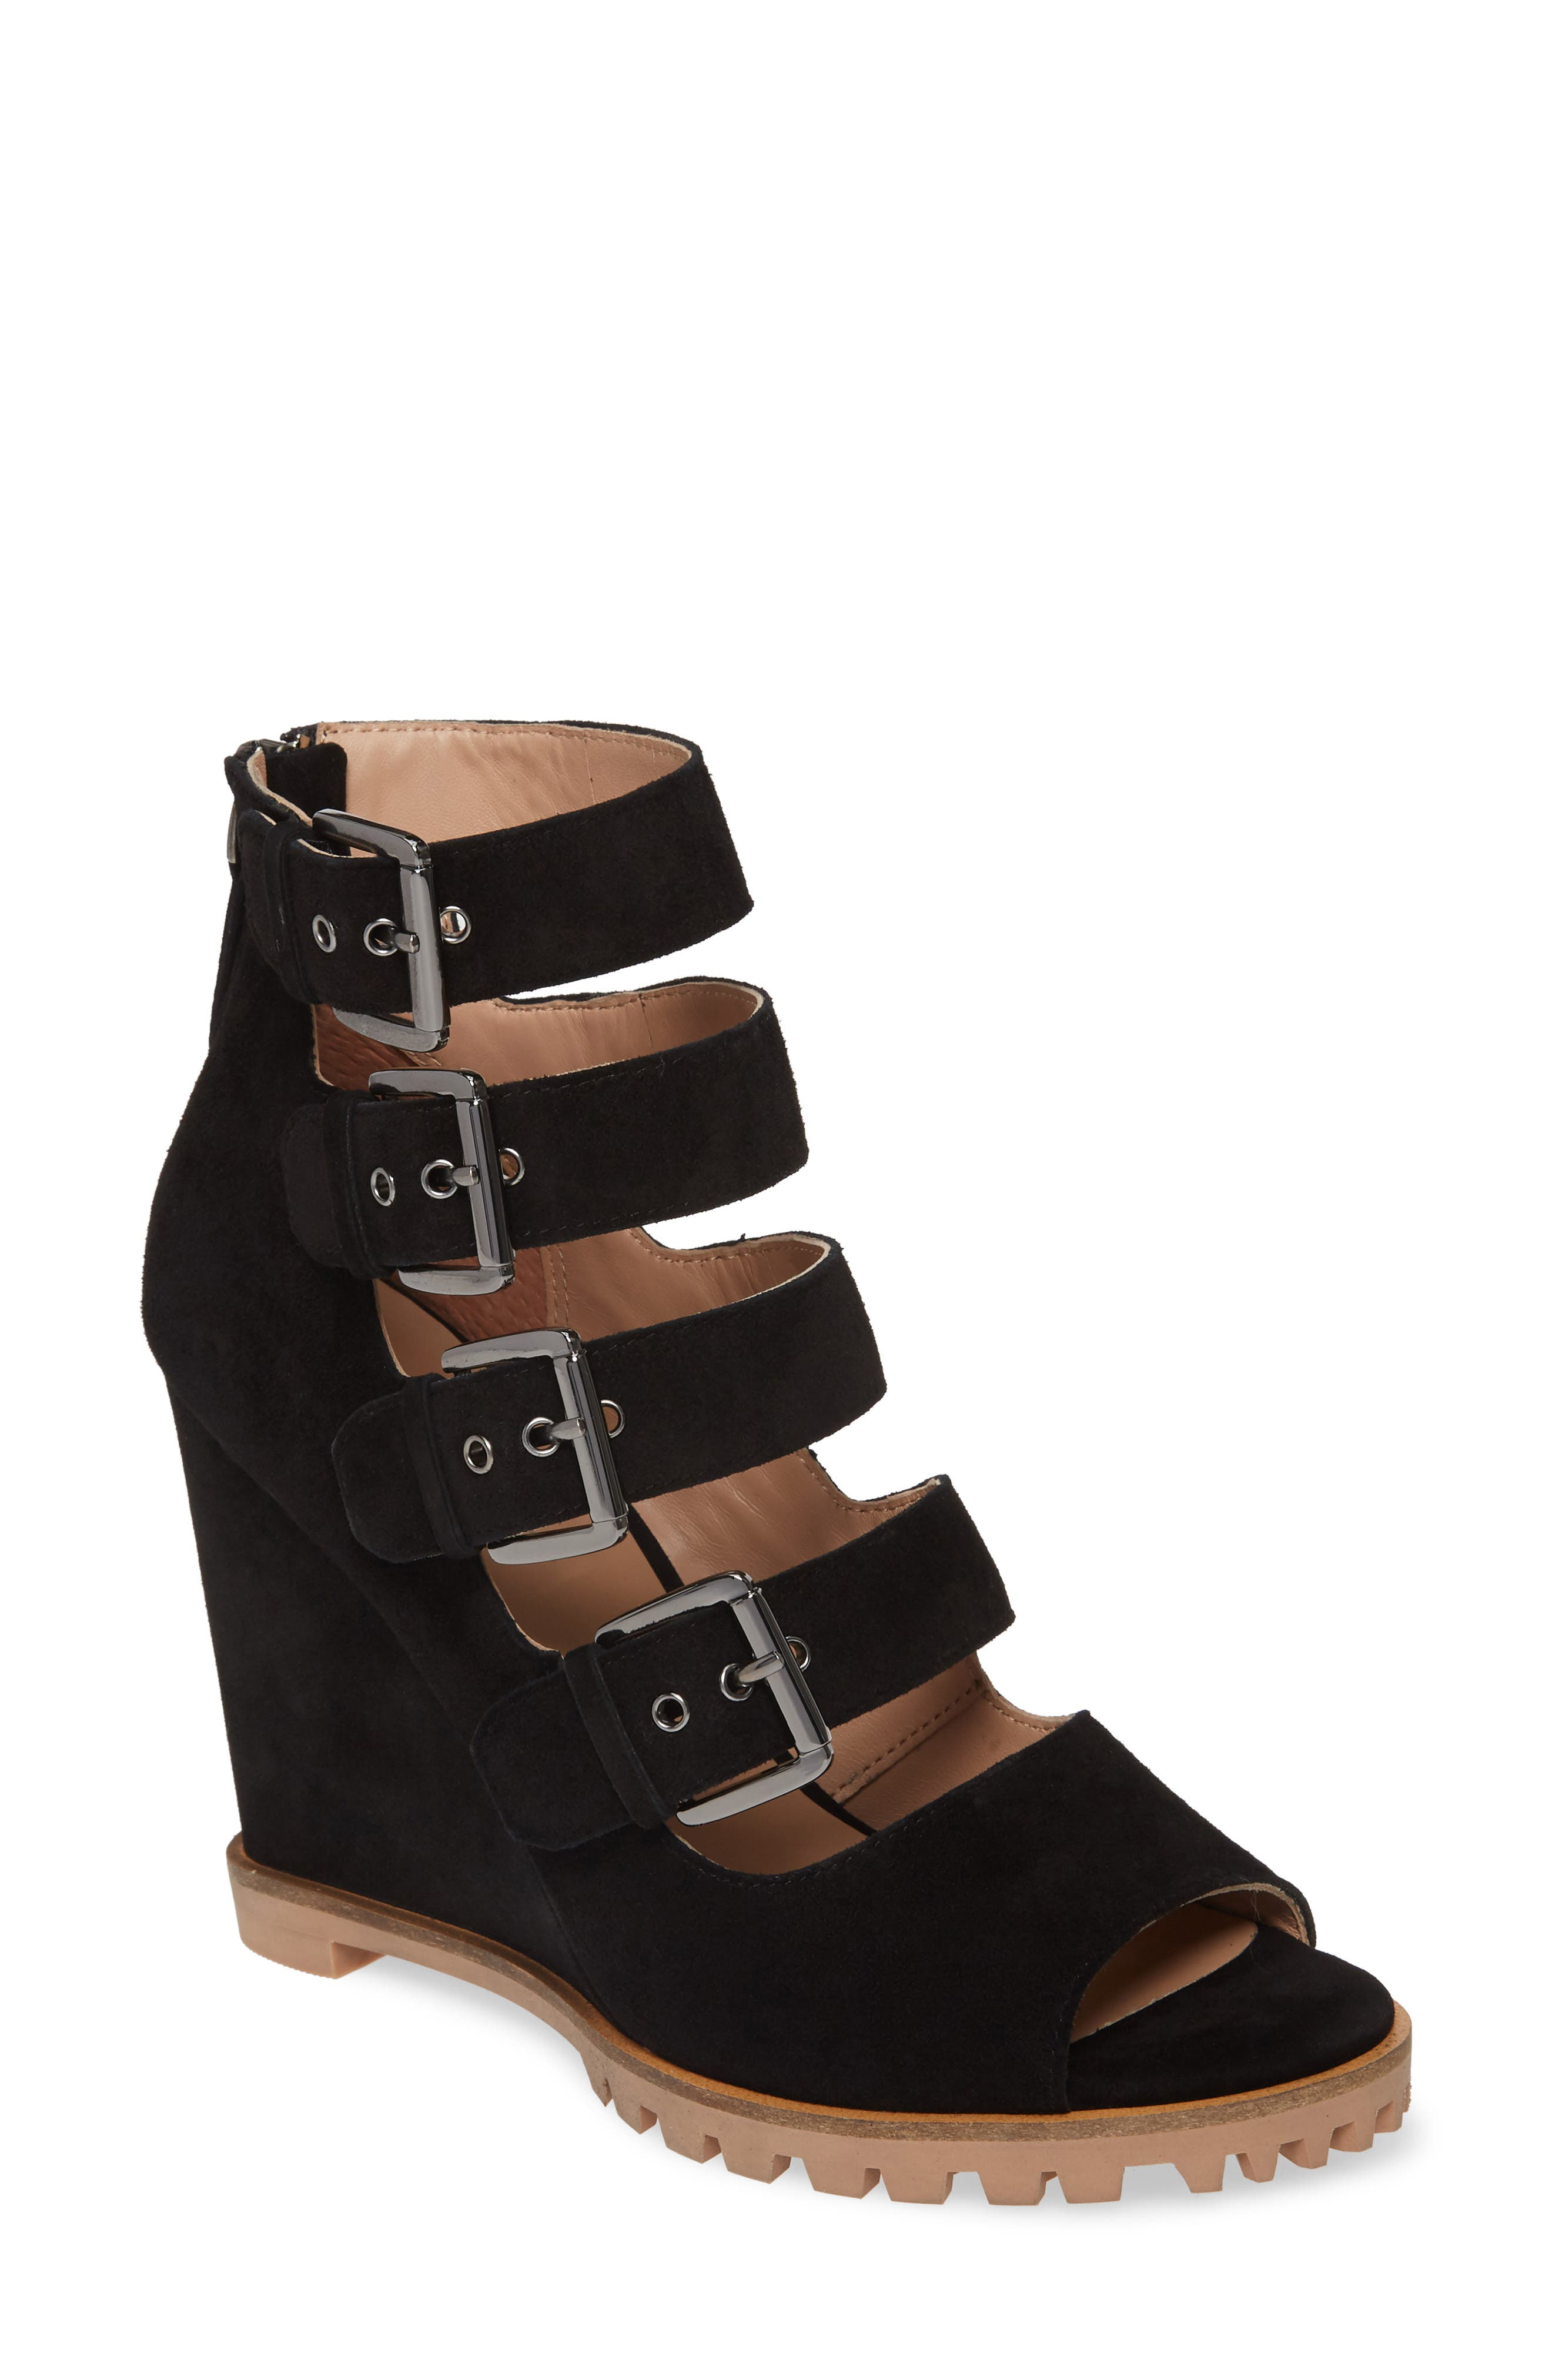 Linea Paolo Wisteria Buckle Wedge Sandal (Women)